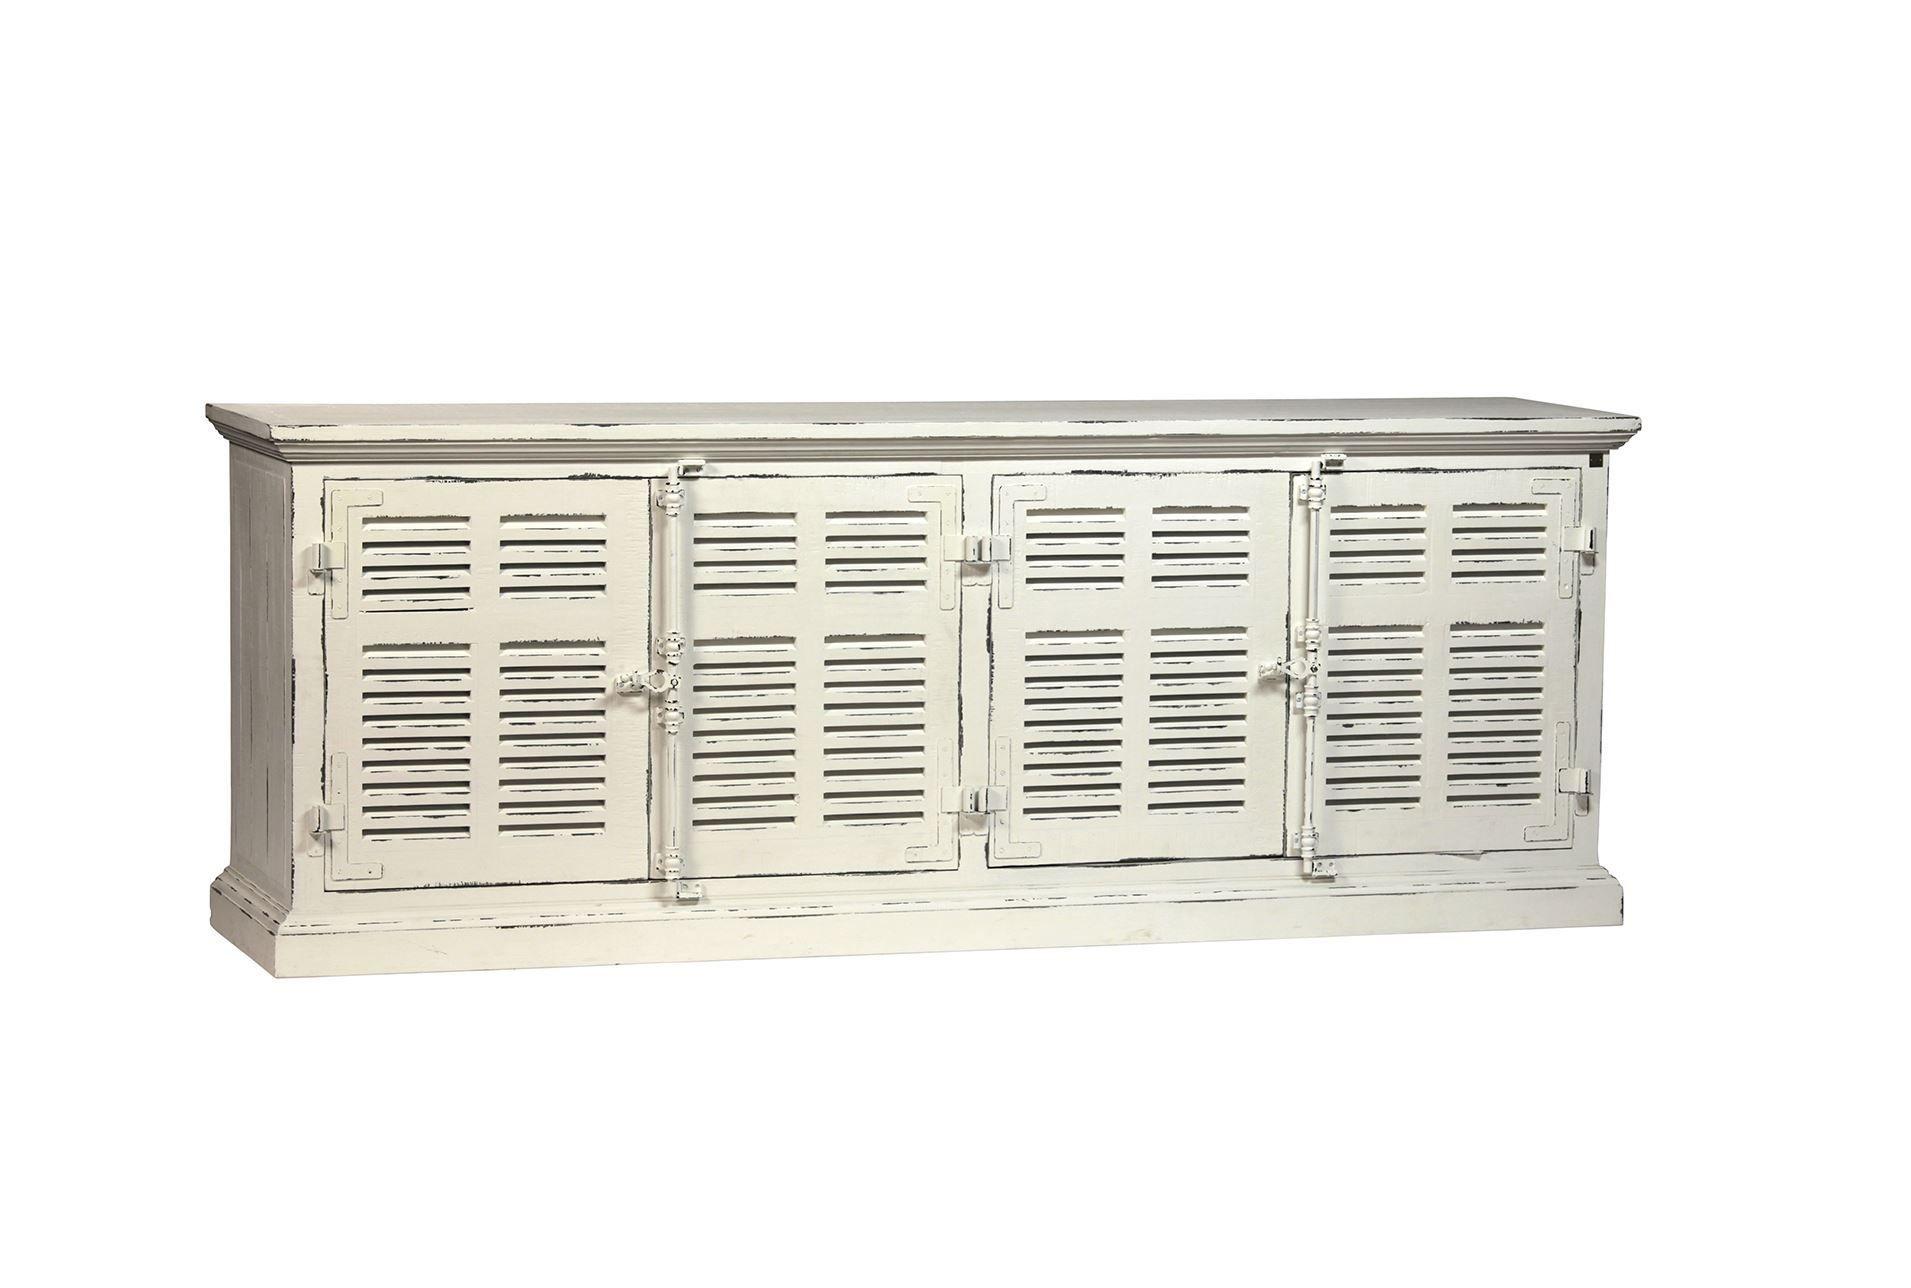 Otb Frozen White Finish Sideboard - Signature   Furniture   Pinterest regarding Burn Tan Finish 2-Door Sideboards (Image 19 of 30)